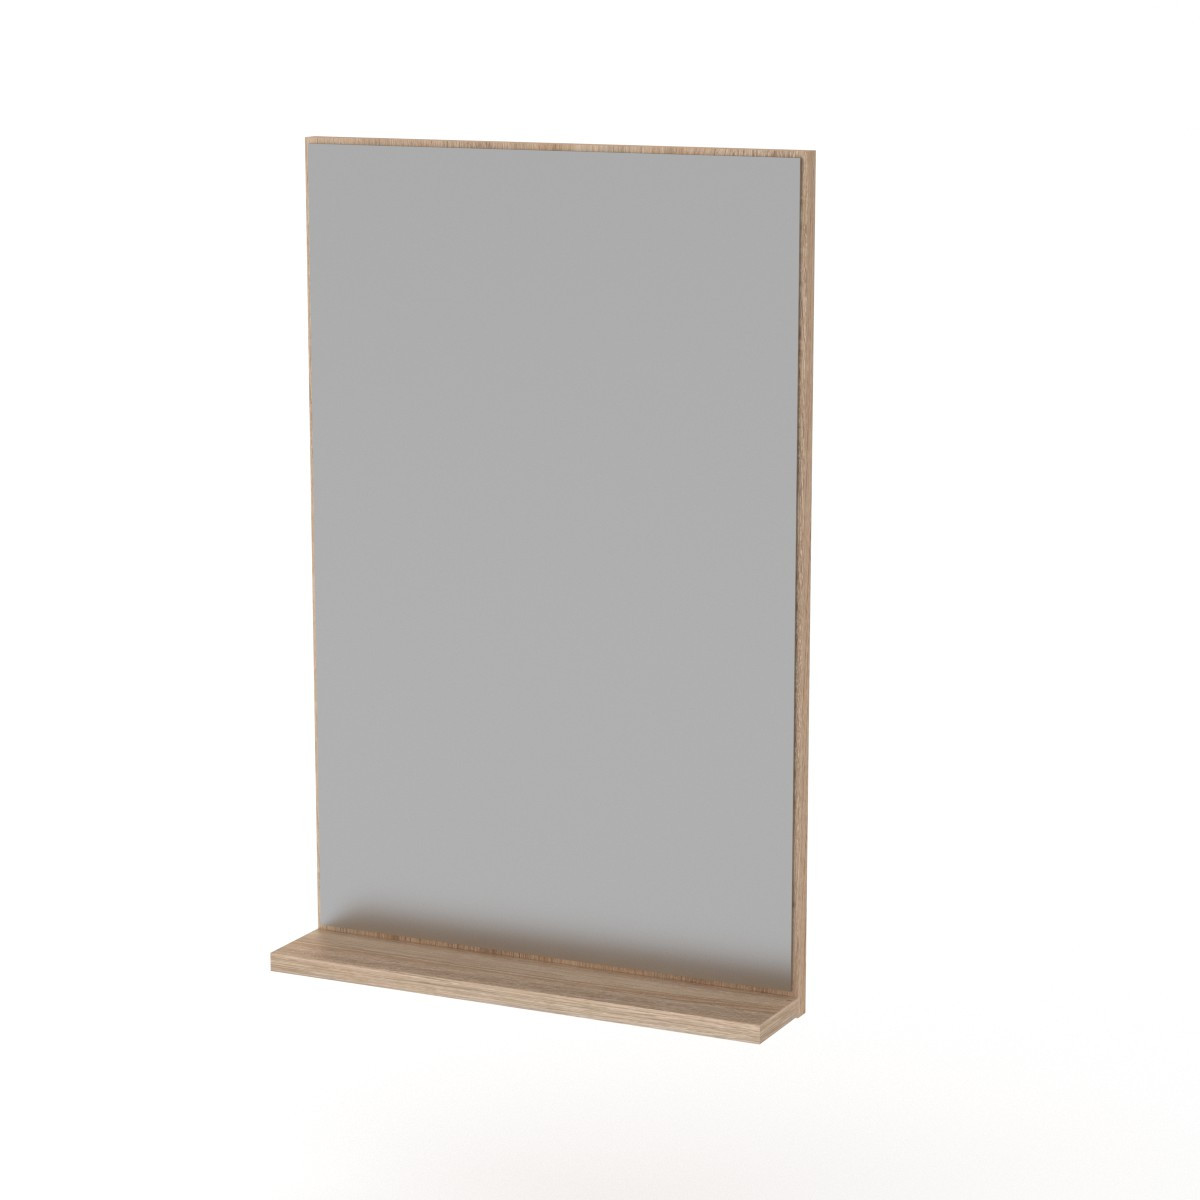 Зеркало-2 дуб сонома Компанит